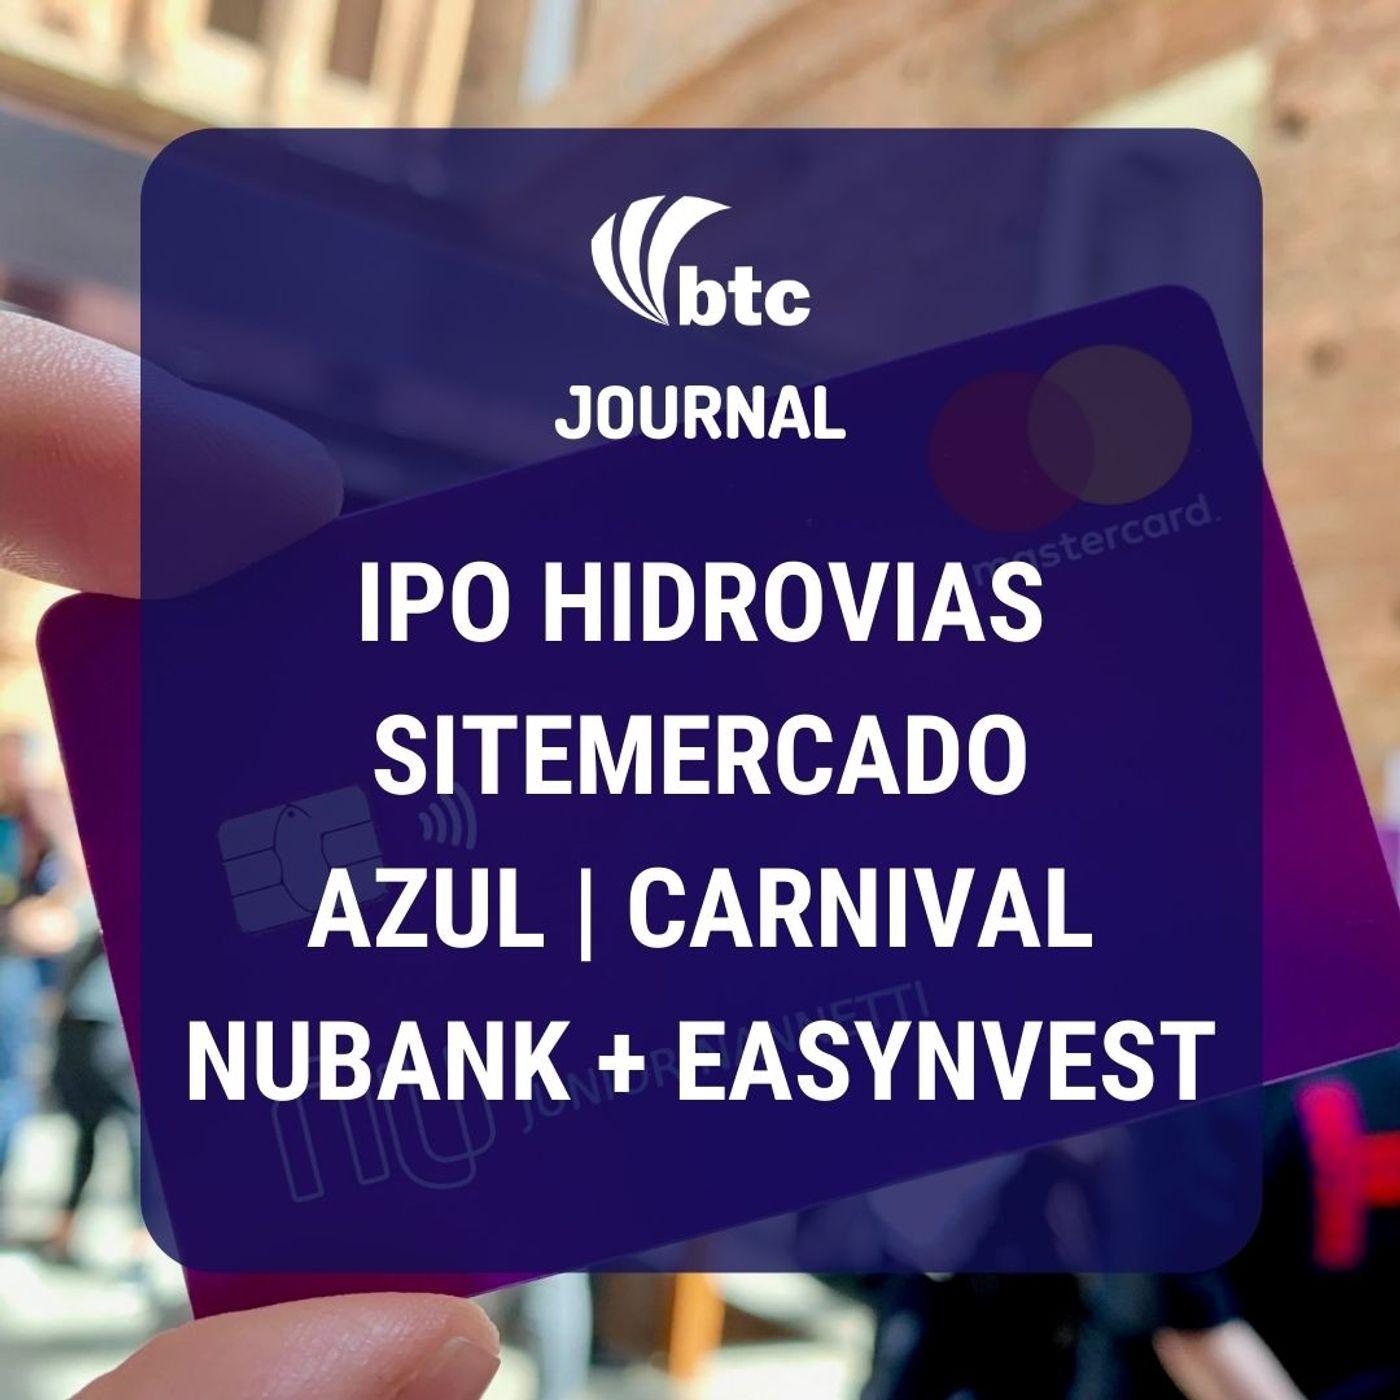 IPO Hidrovias, Nubank + Easynvest, SiteMercado, Laureate, Azul e Carnival | BTC Journal 17/09/20